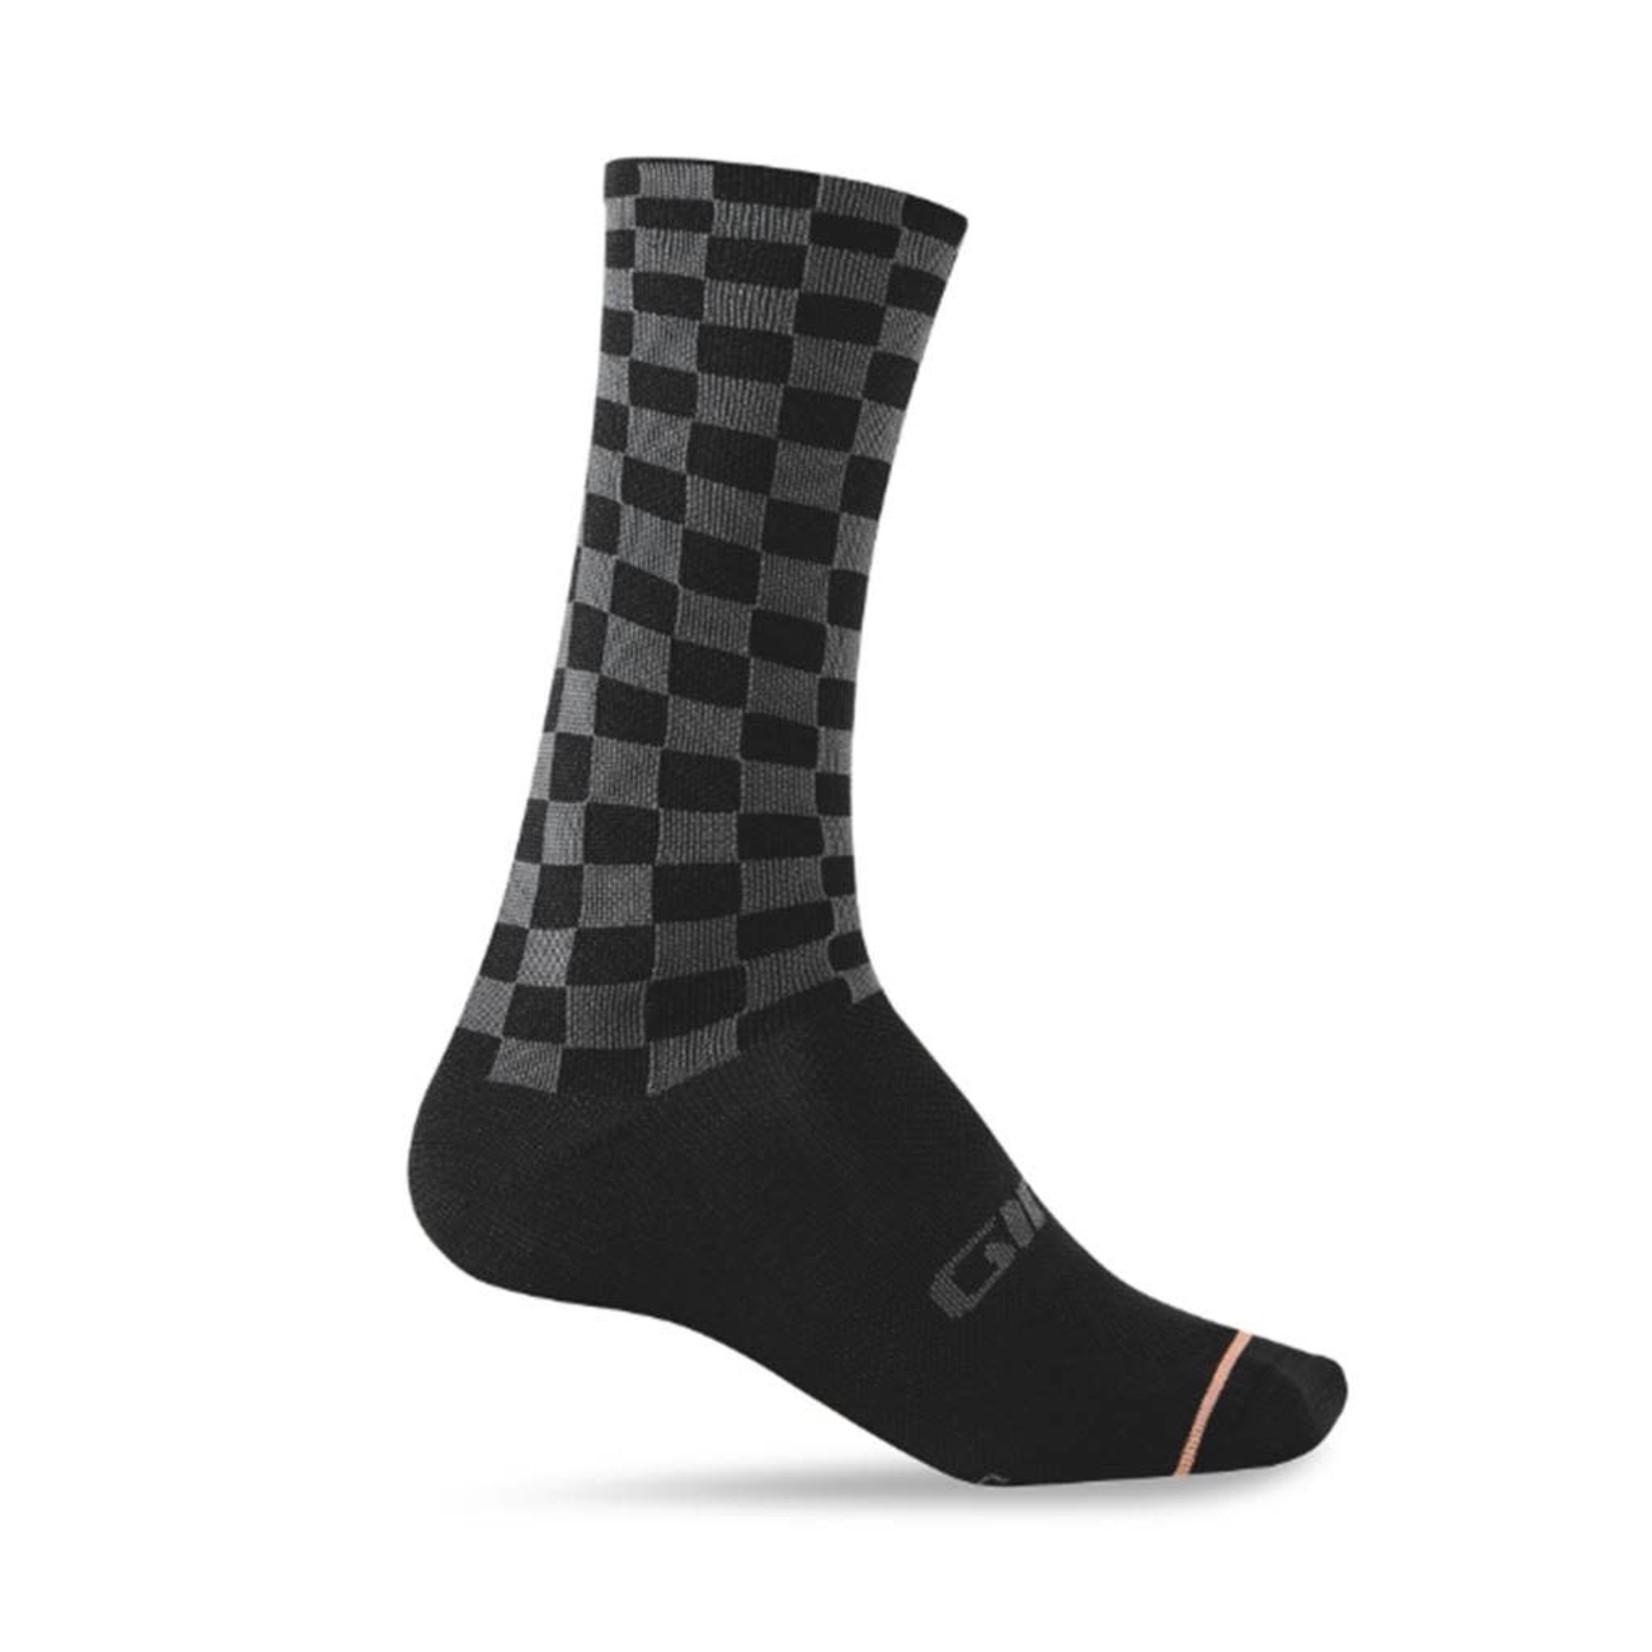 Giro Cycling Comp High Rise Socks Checkered